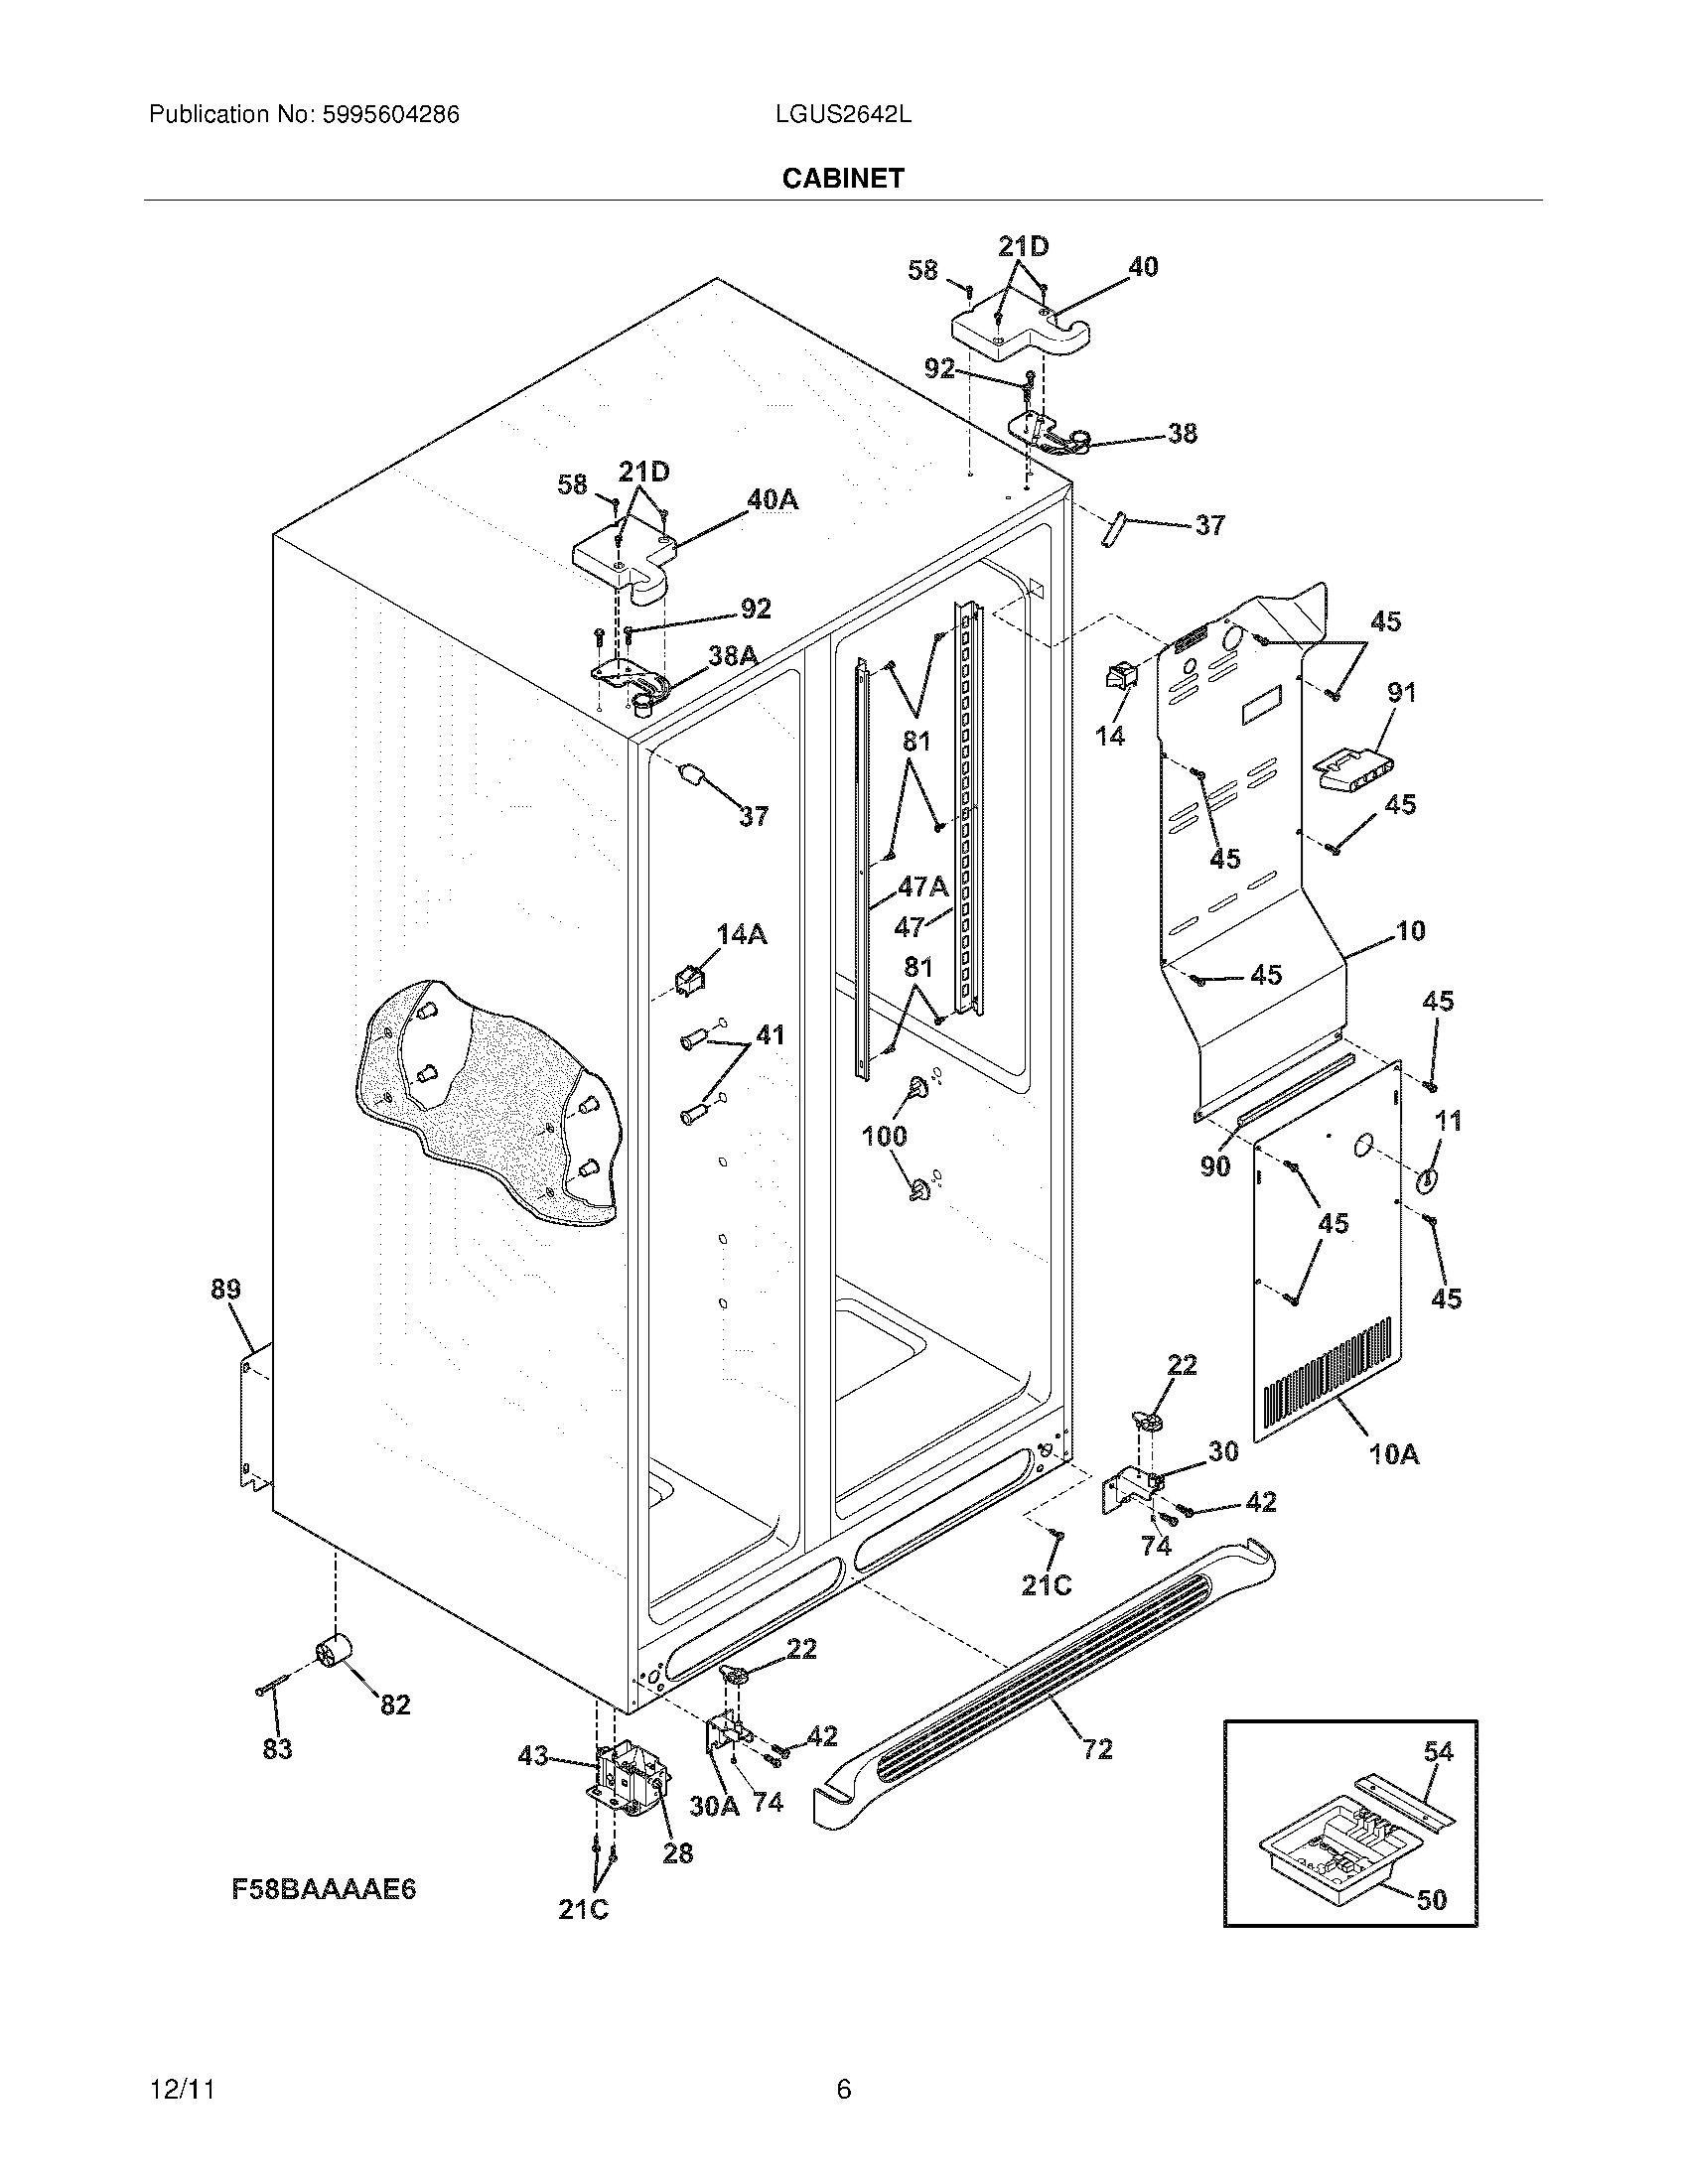 holden vr v6 wiring diagram fire engine clipart, Wiring diagram